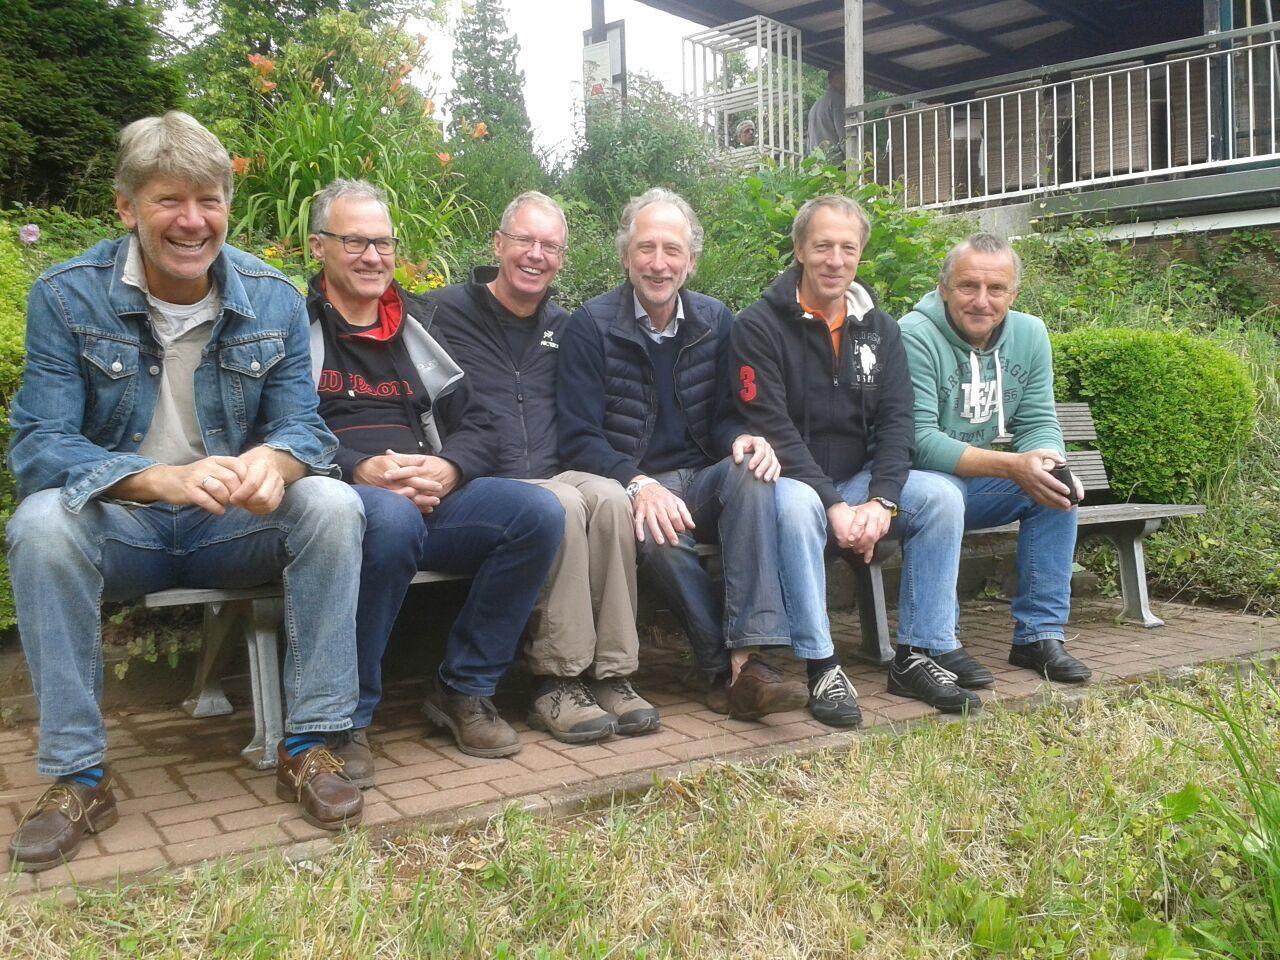 Herren-Mannschaft 50